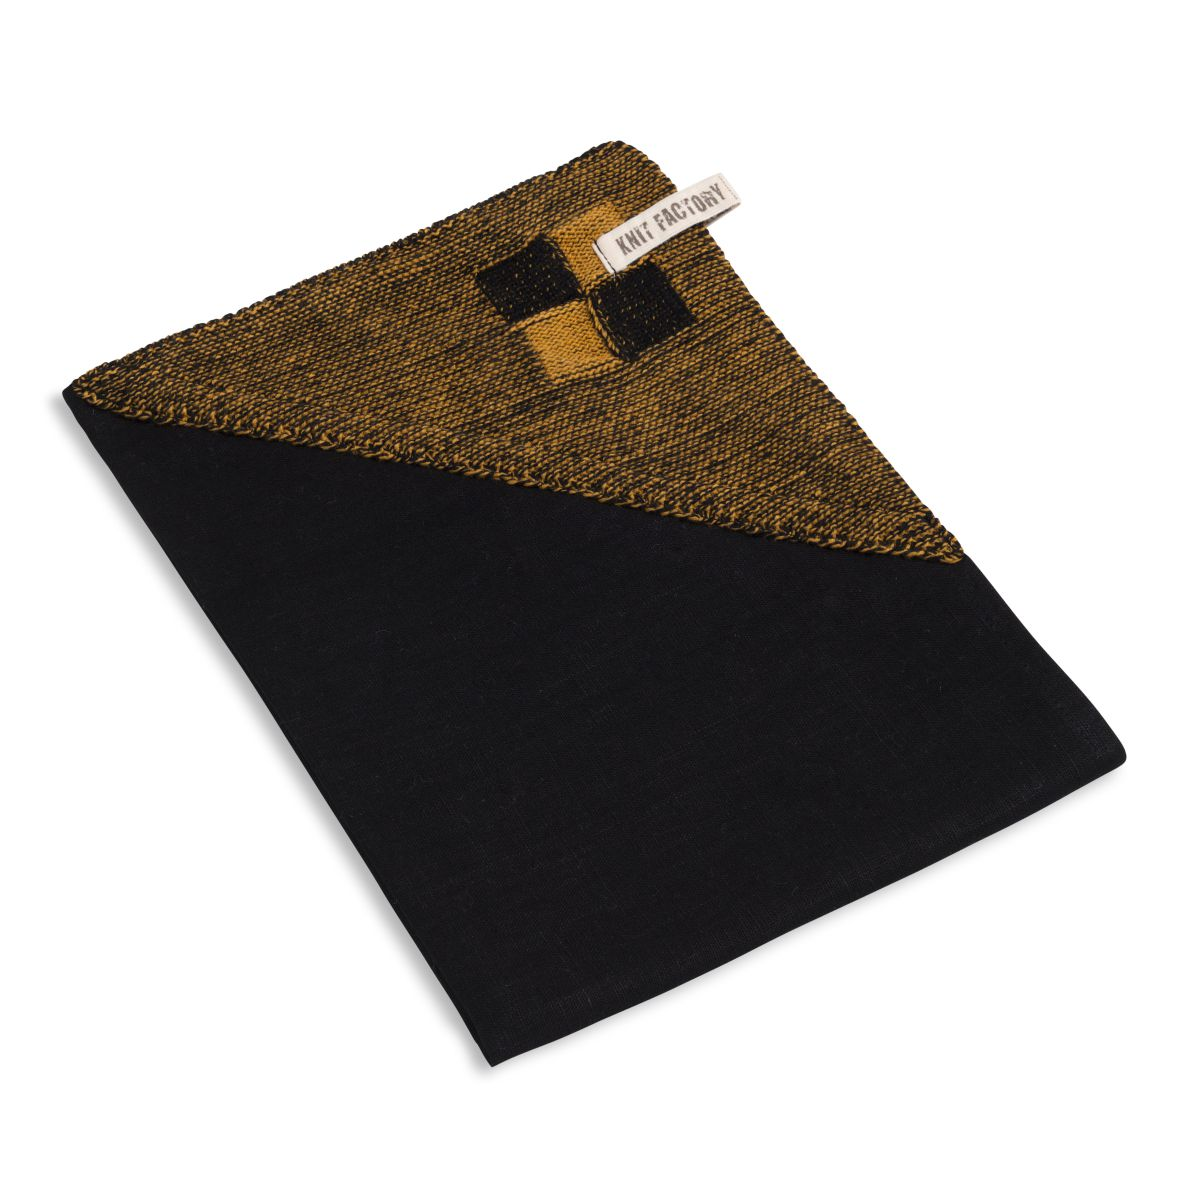 geschirrtuch block schwarzocker